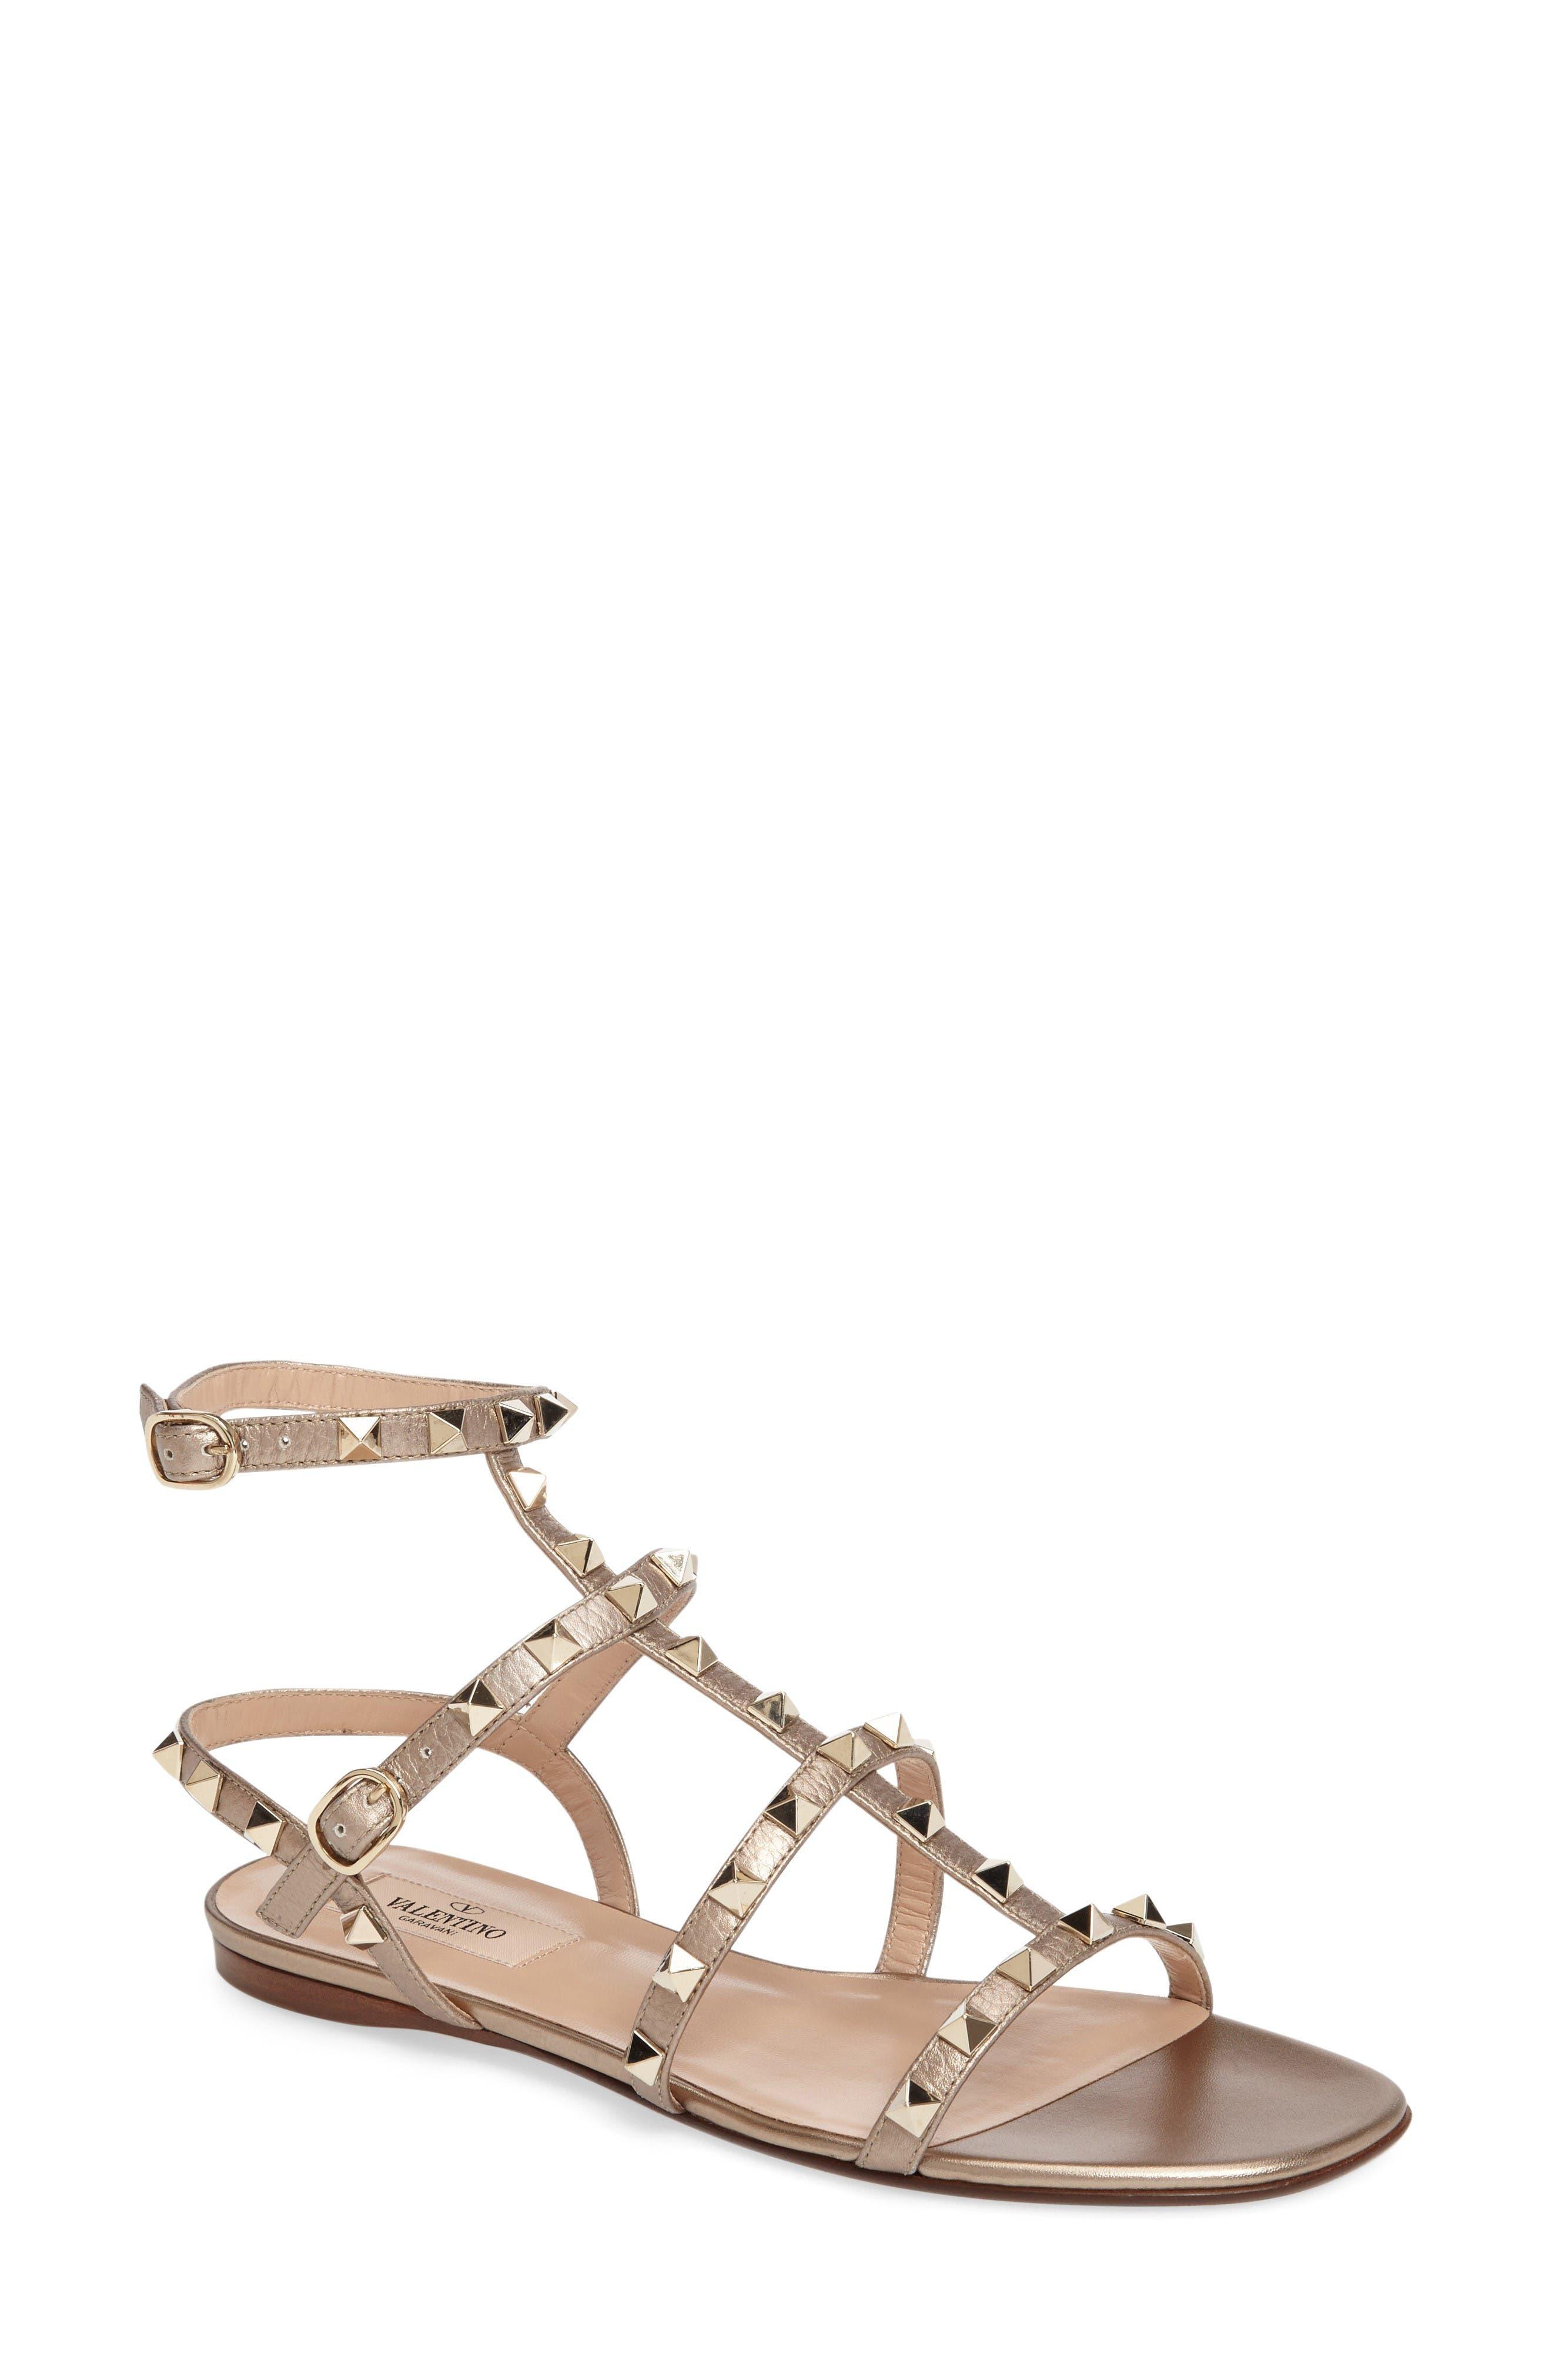 Main Image - VALENTINO GARAVANI 'Rockstud' Gladiator Sandal (Women)